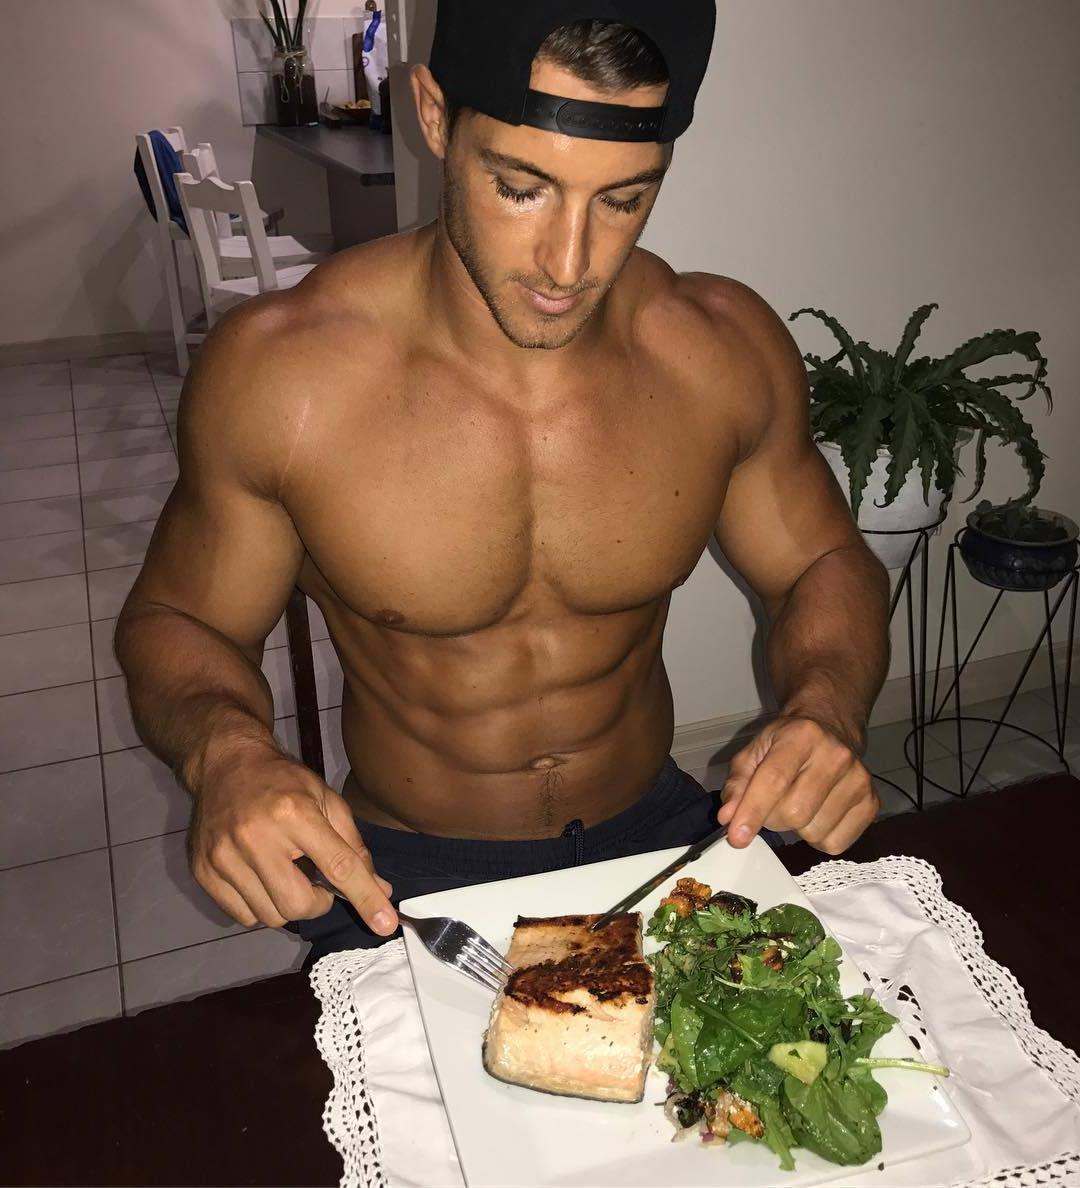 hot-guys-eating-food-fit-shirtless-muscular-body-hunks